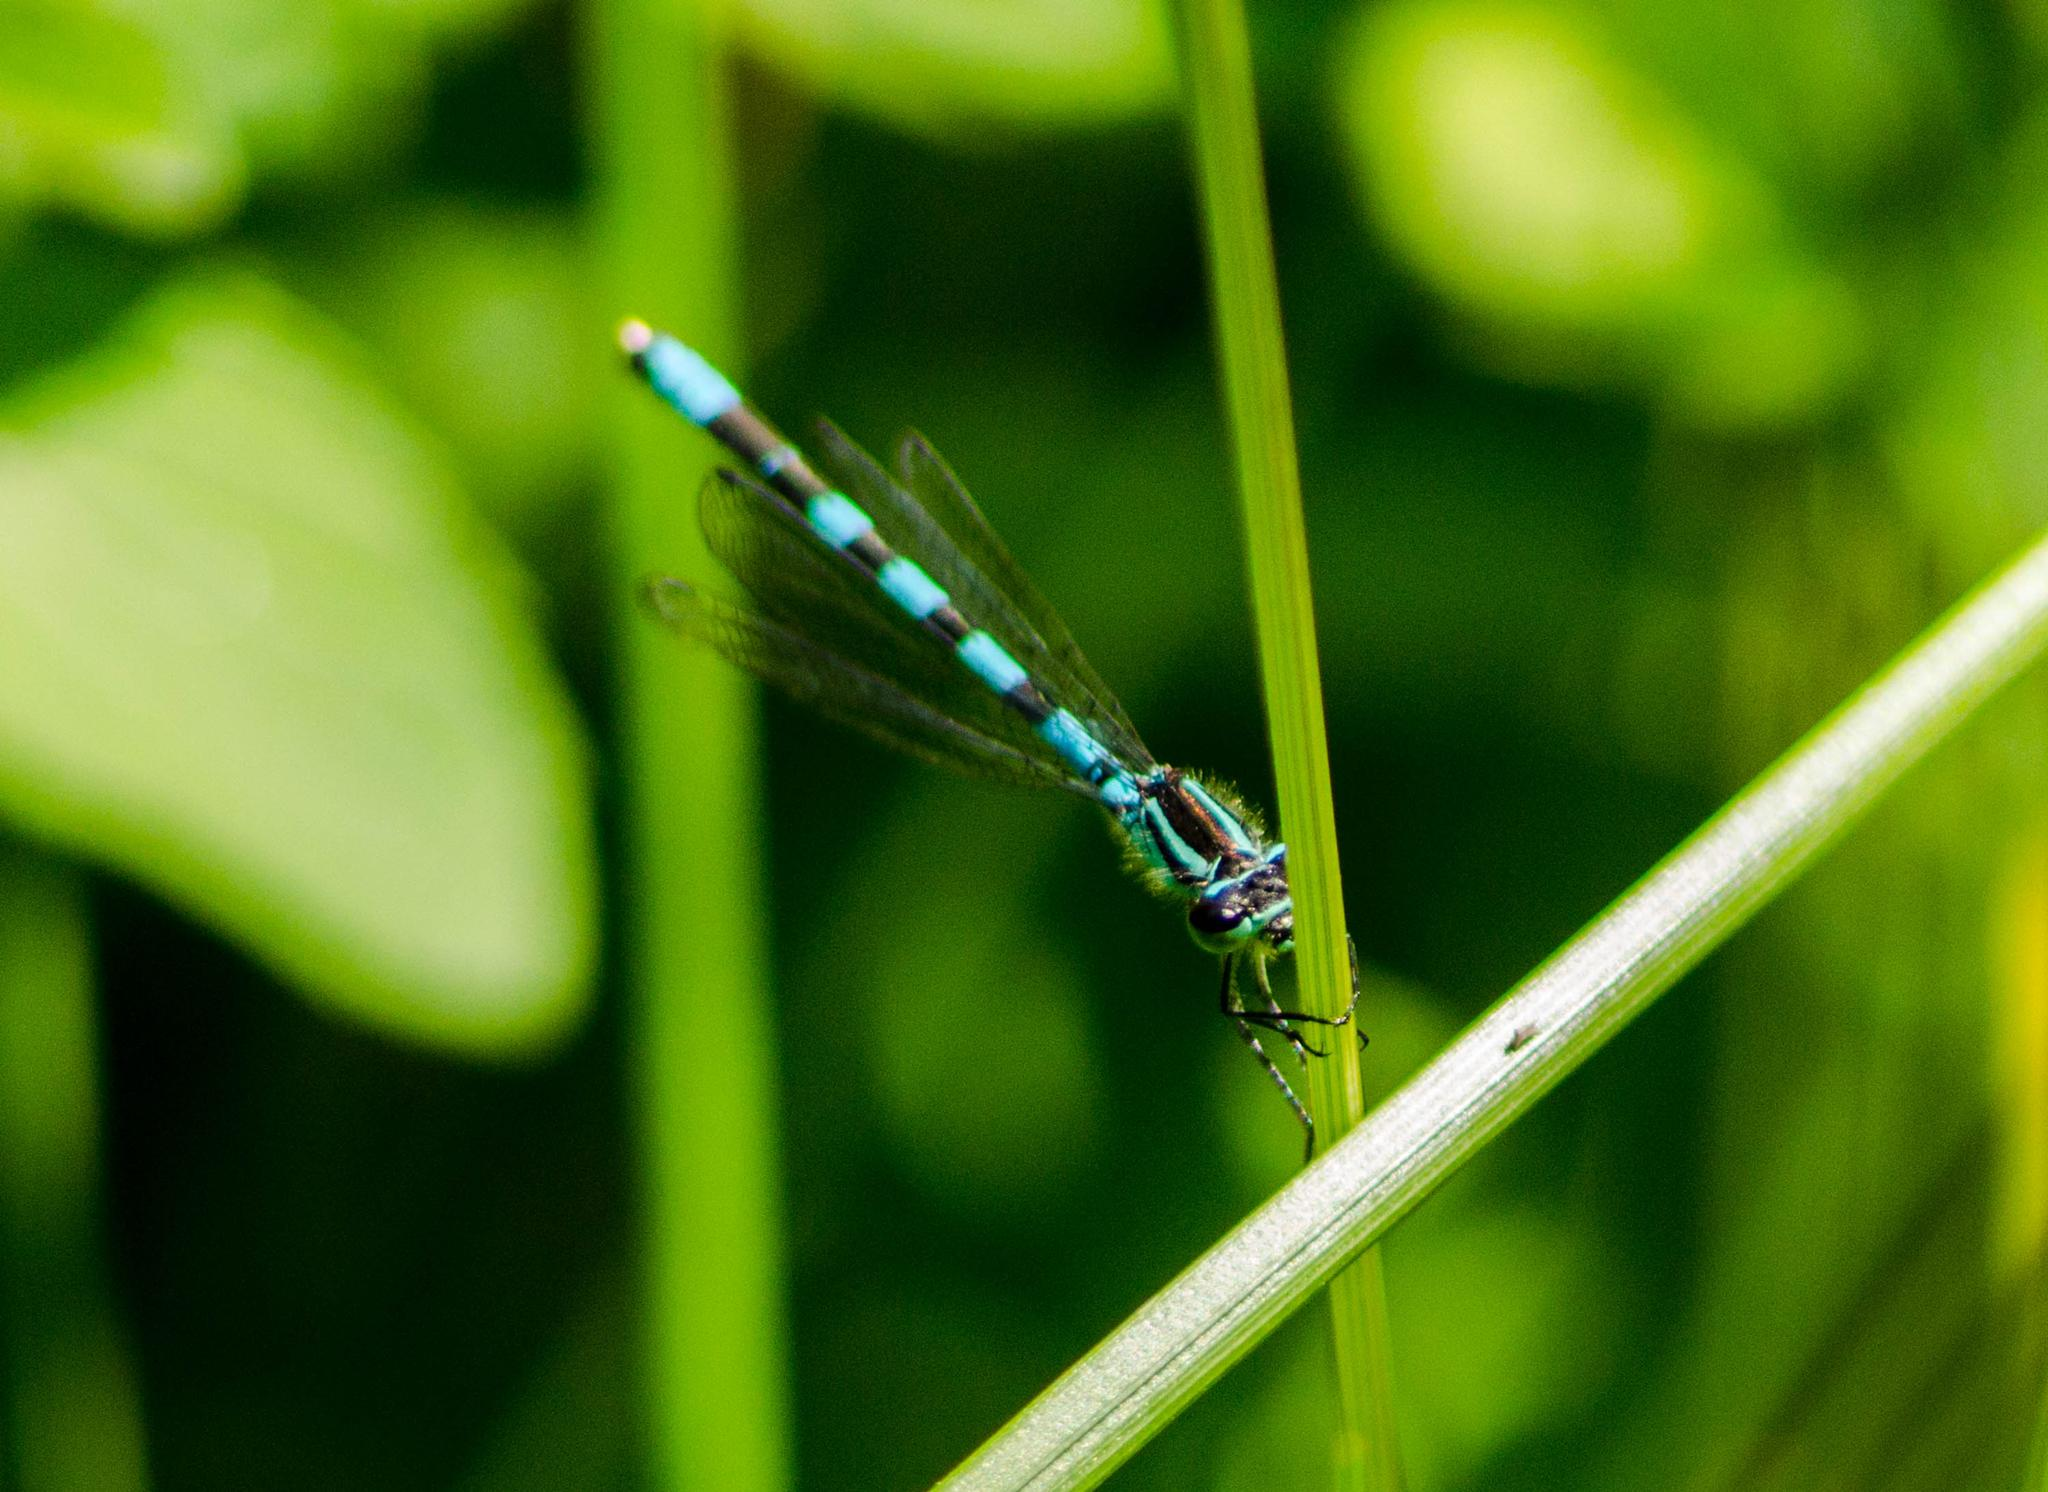 Dragonfly by Maria Johansson